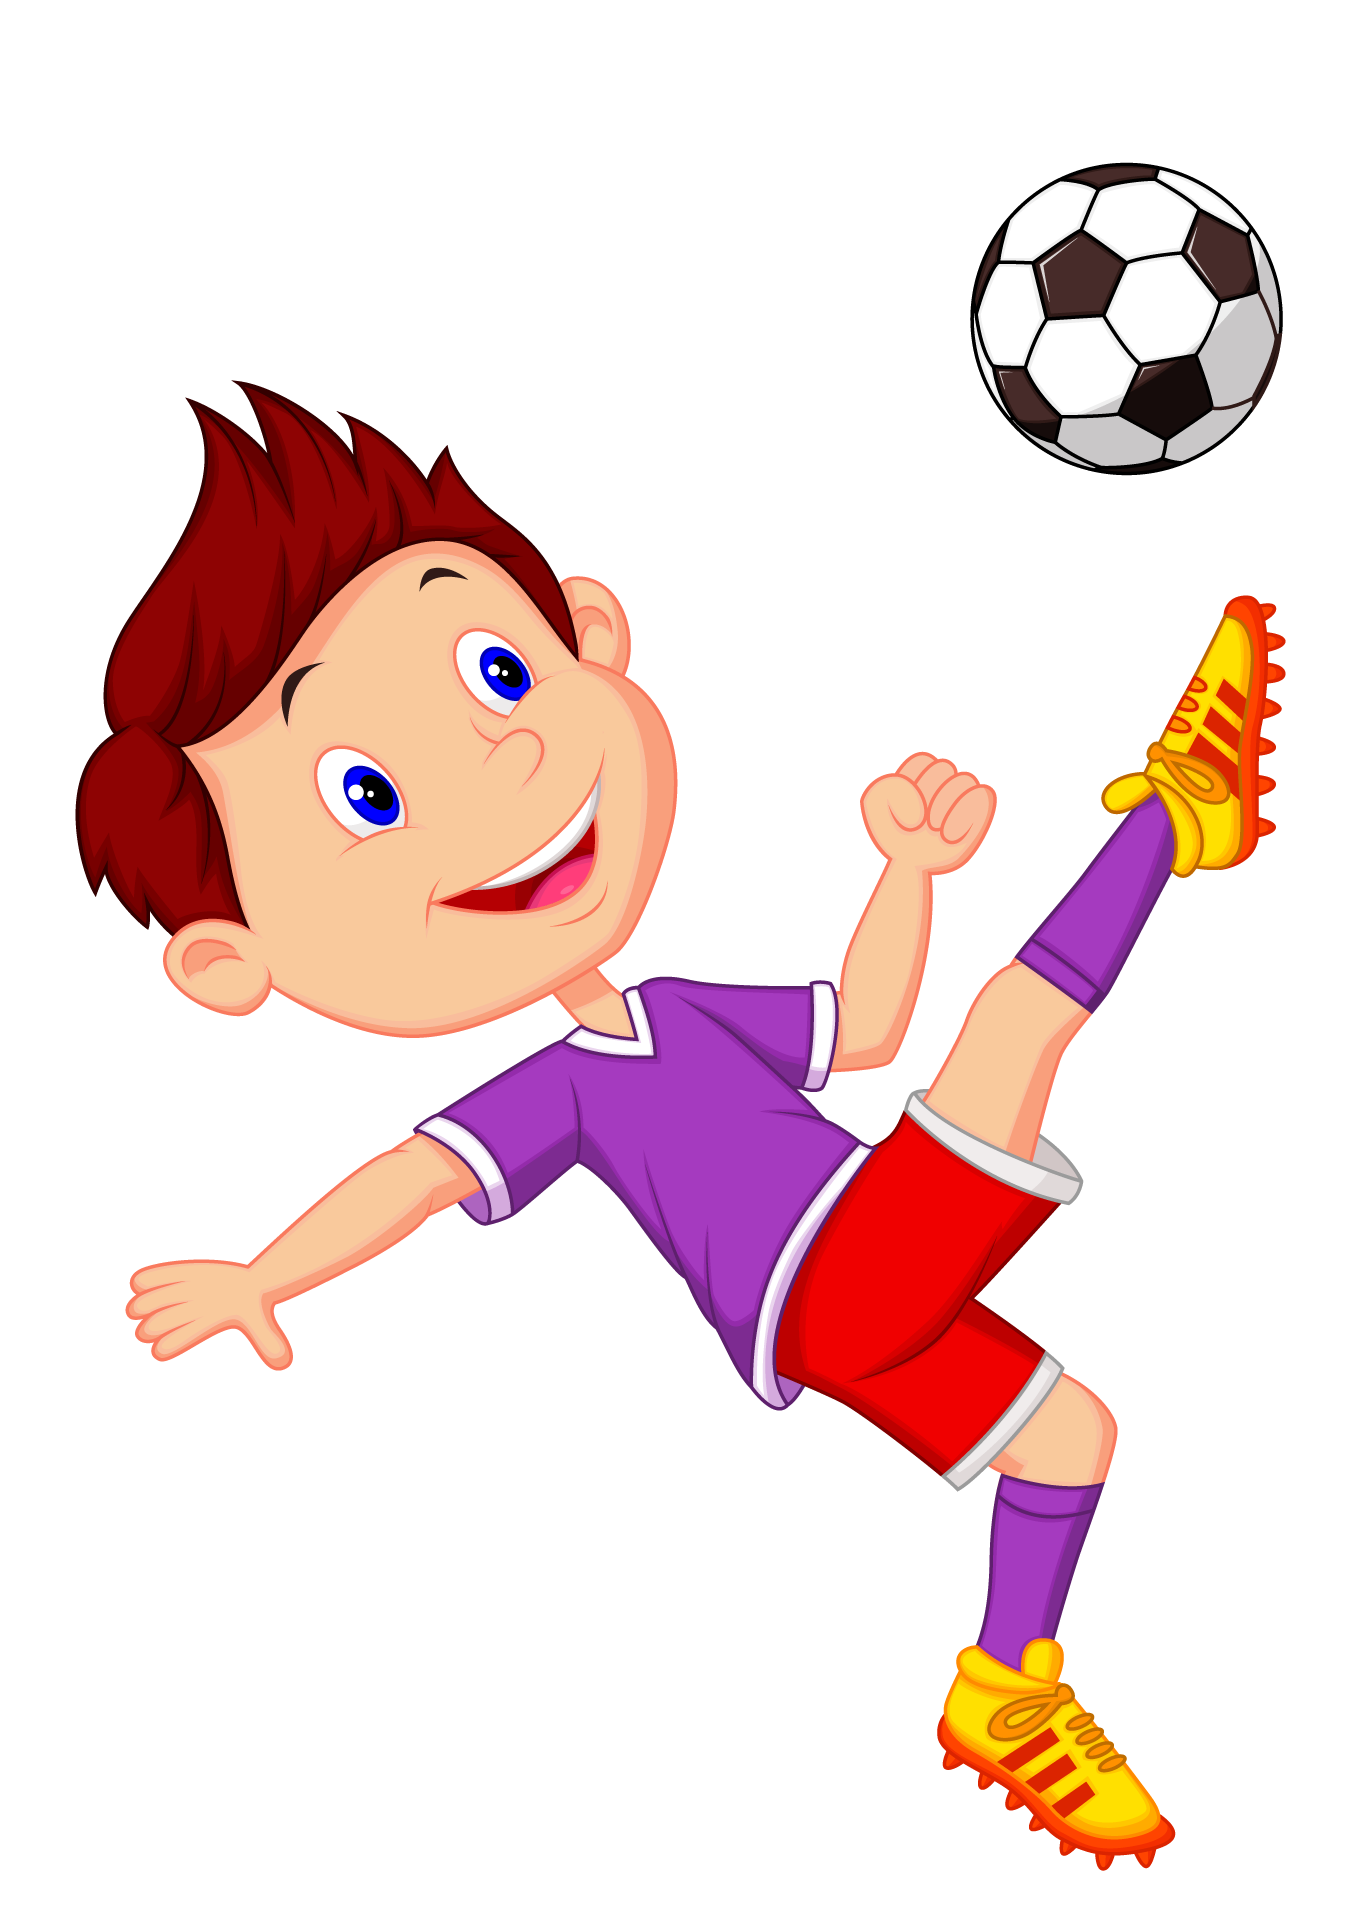 Pin de Людмила en картинки детям Dibujo de niños jugando